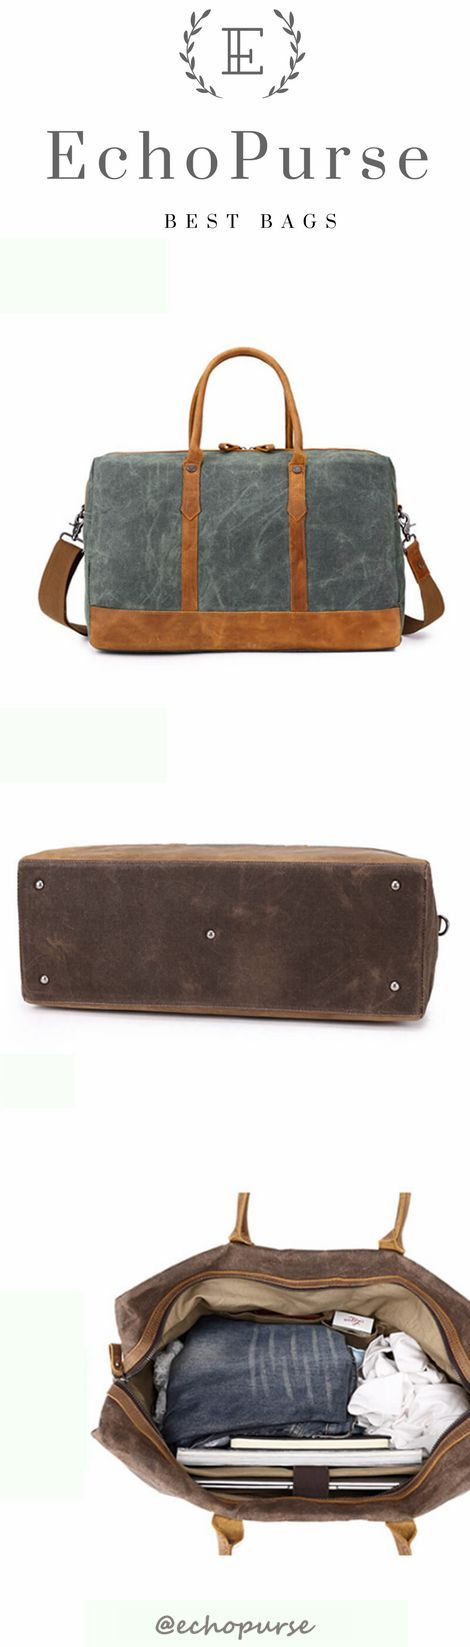 Vintage Style Men's Travel Bag, Aqua Green Crazy Horse Leather Handmade Canvas Duffel Bag 907